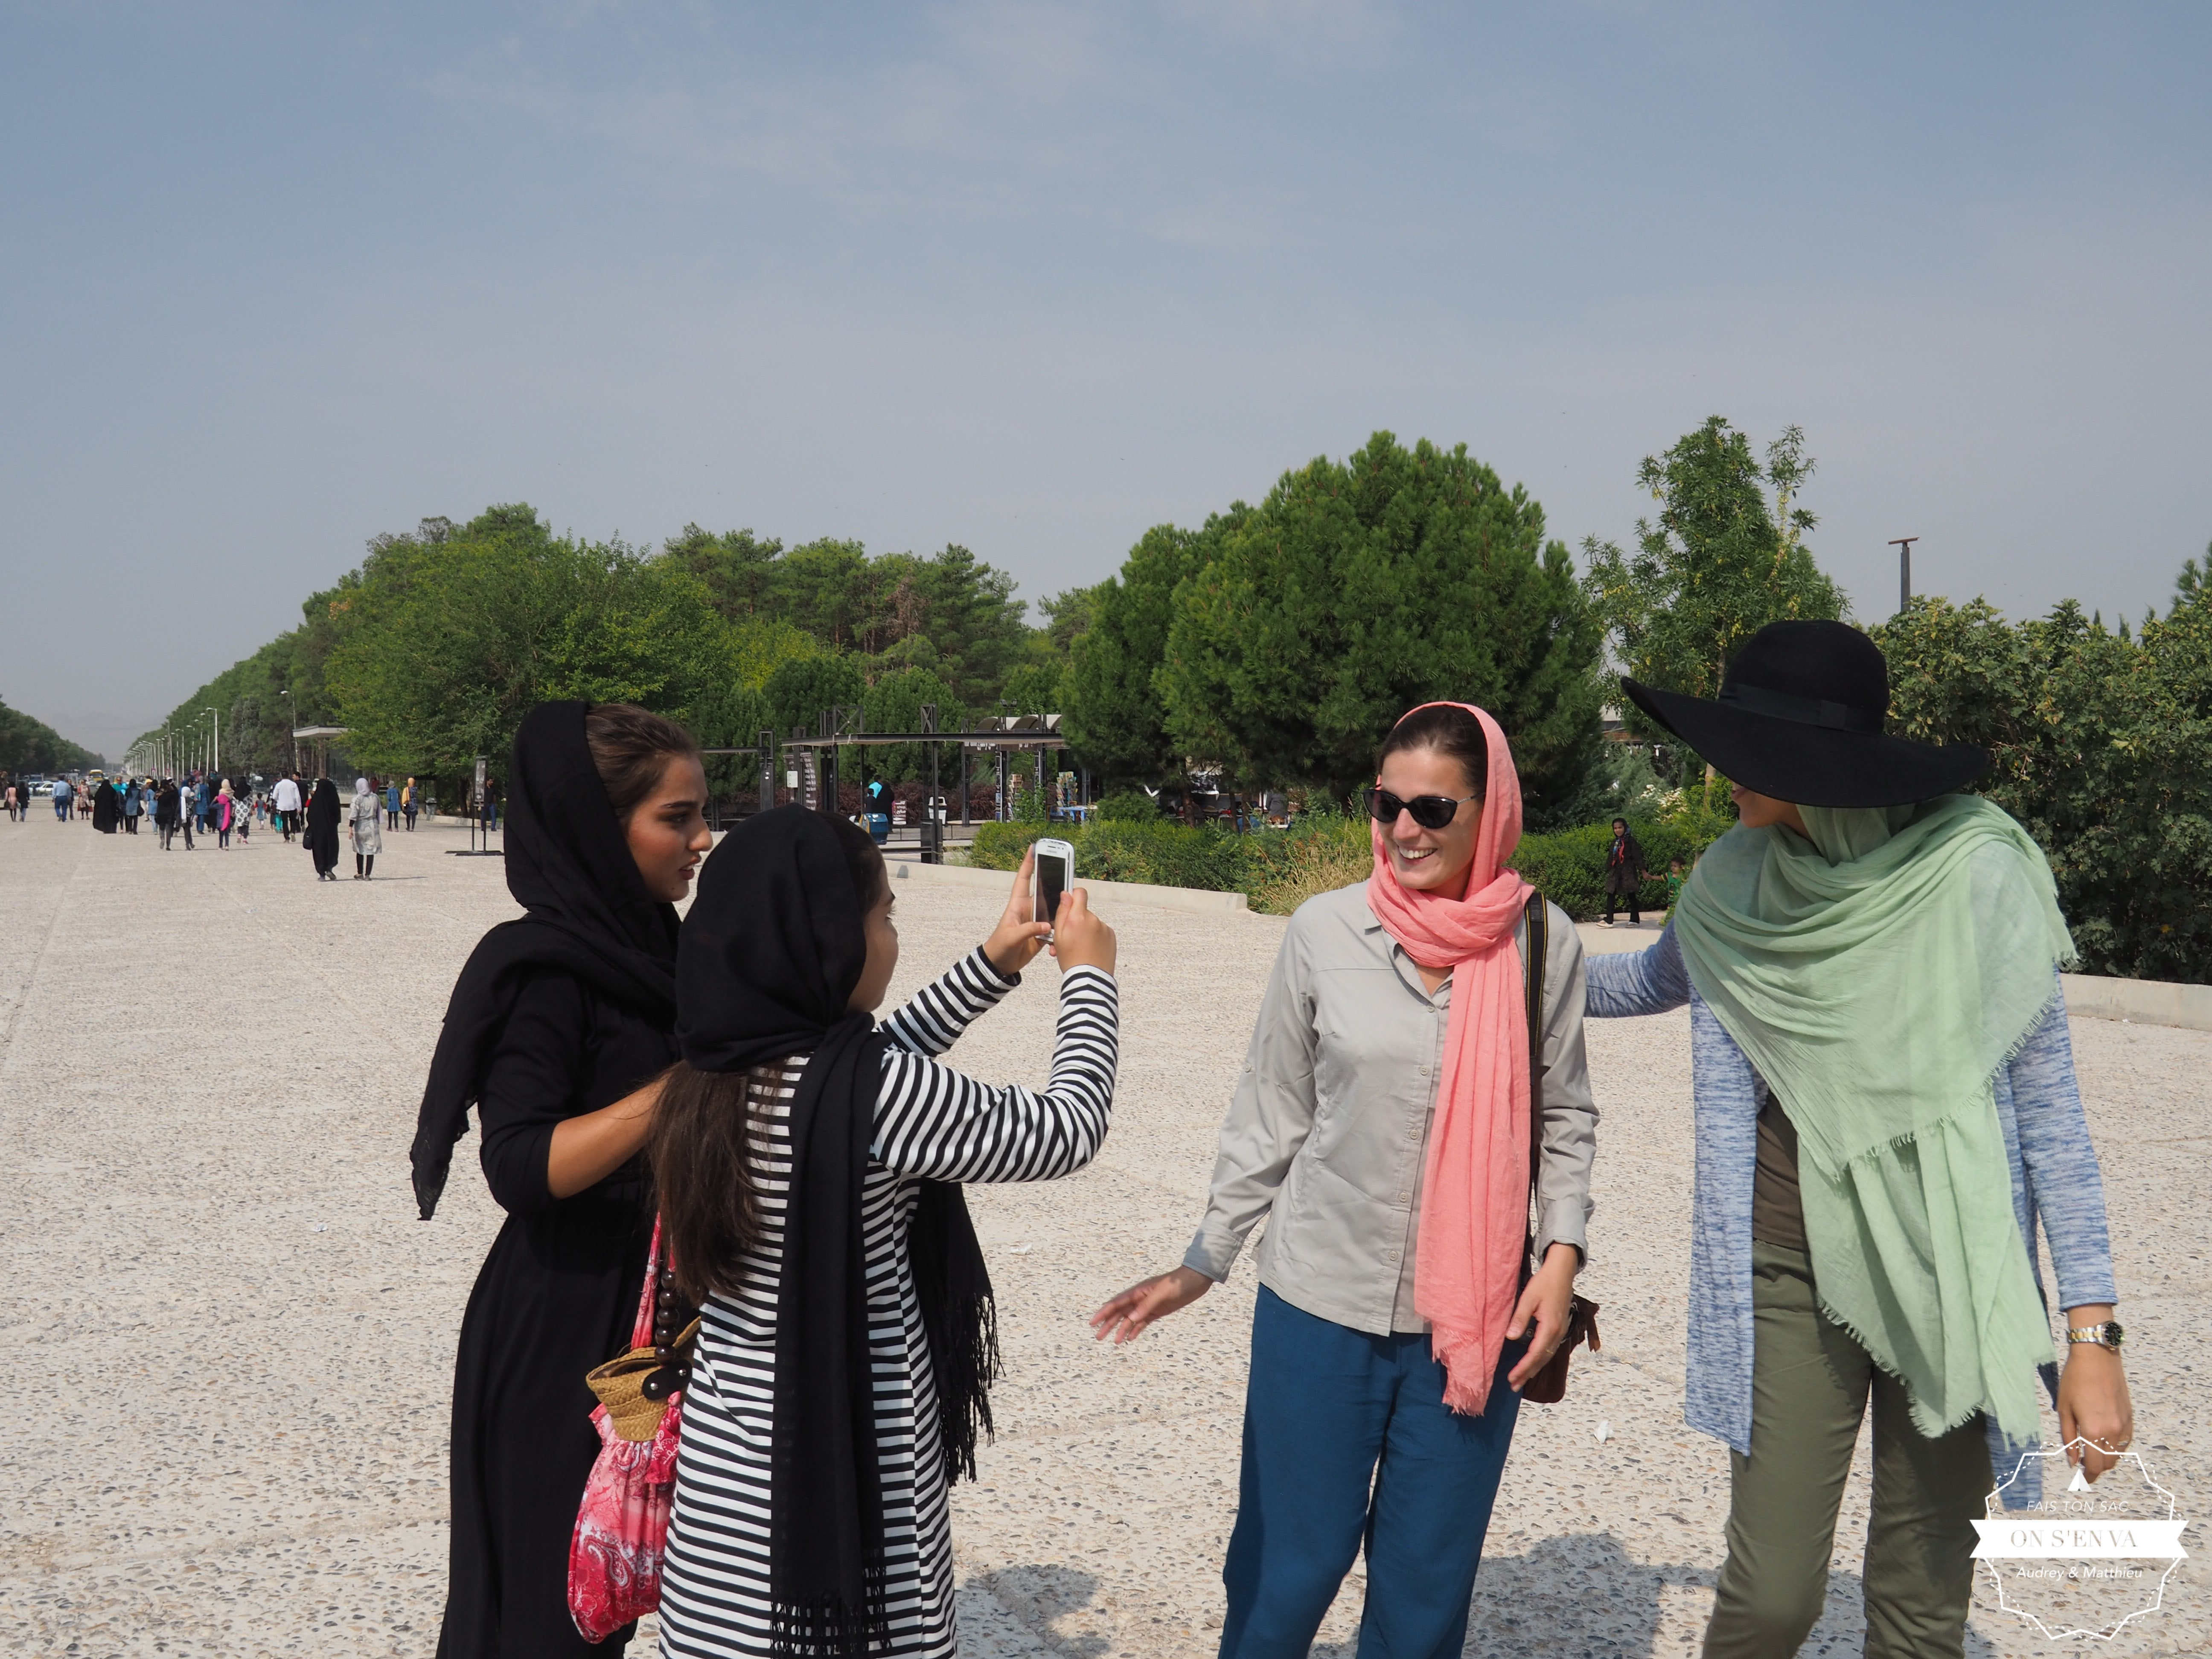 En arrivant à Persepolis